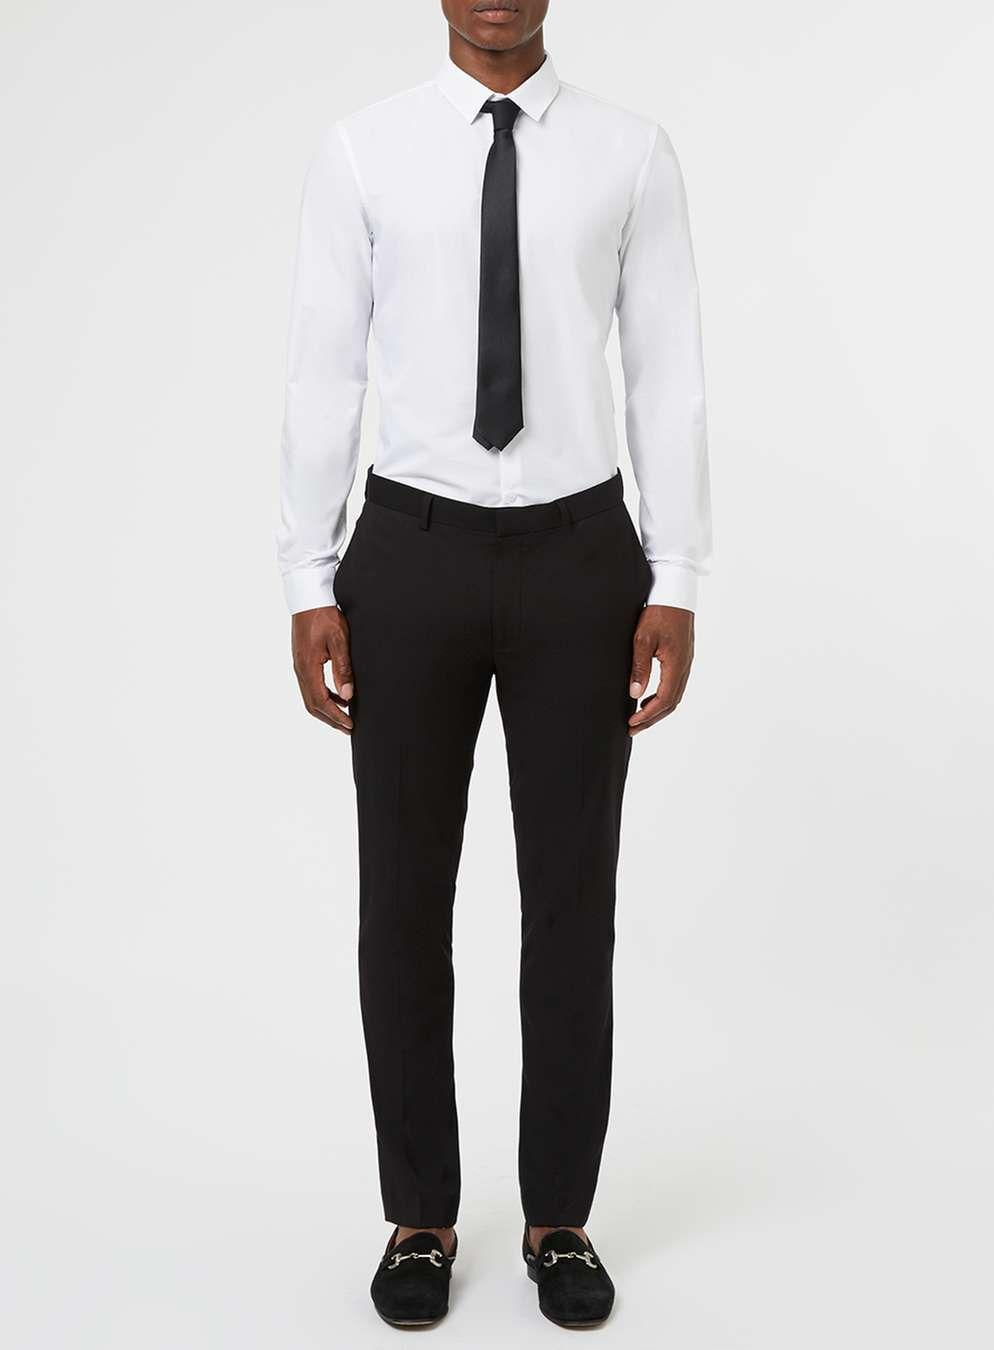 White Dress Shirt And Black Tie Set Men S Collared Shirts Clothing White Shirt Men White Shirt Black Pants White Shirt Dress [ 1350 x 994 Pixel ]